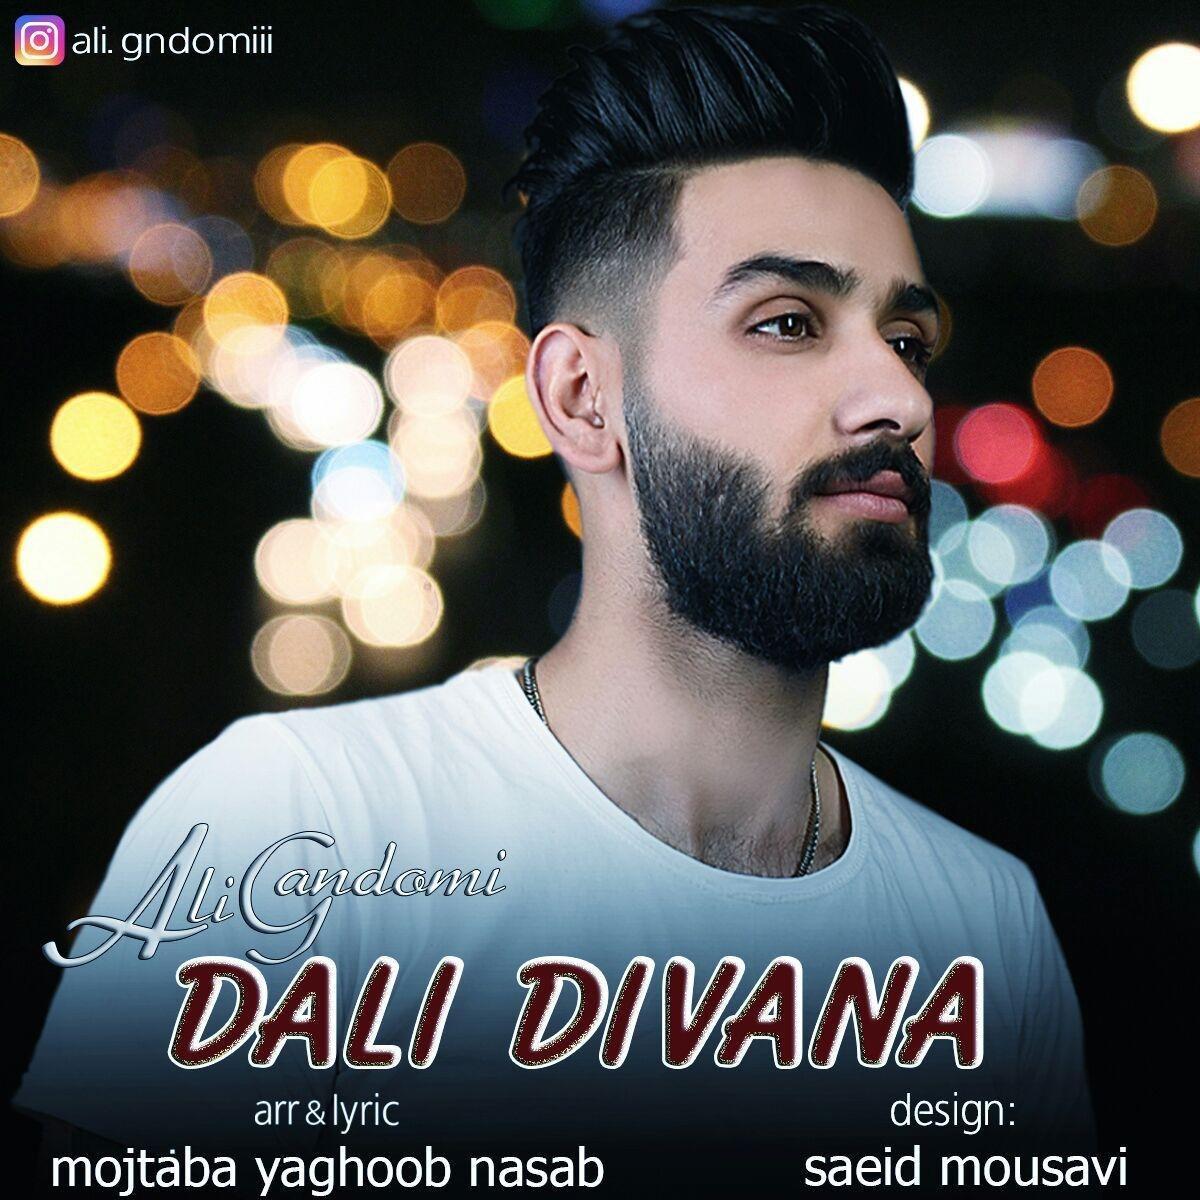 http://s5.picofile.com/file/8396784584/07Ali_Gandomi_Dali_Divana.jpg